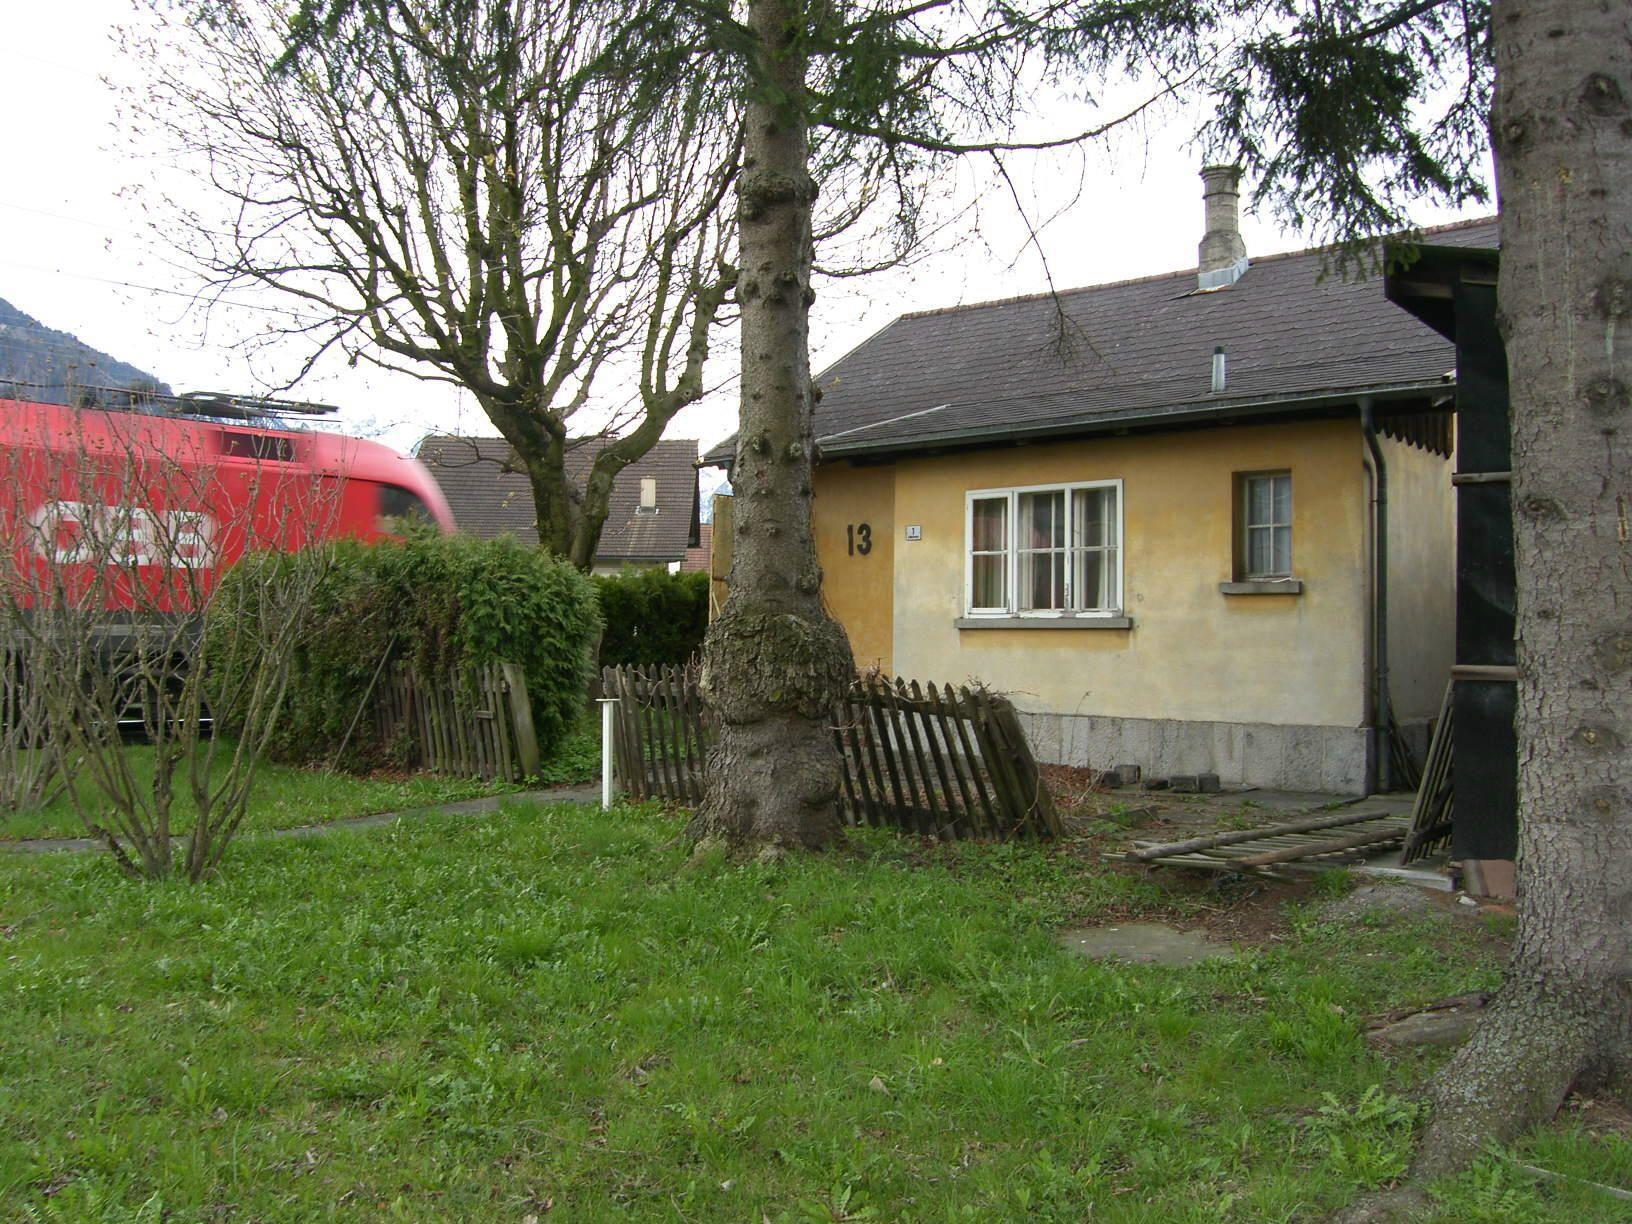 Das um 1871 errichtete Bahnwächterhäusen 13 nahe dem Bahnhof Schaan-Vaduz